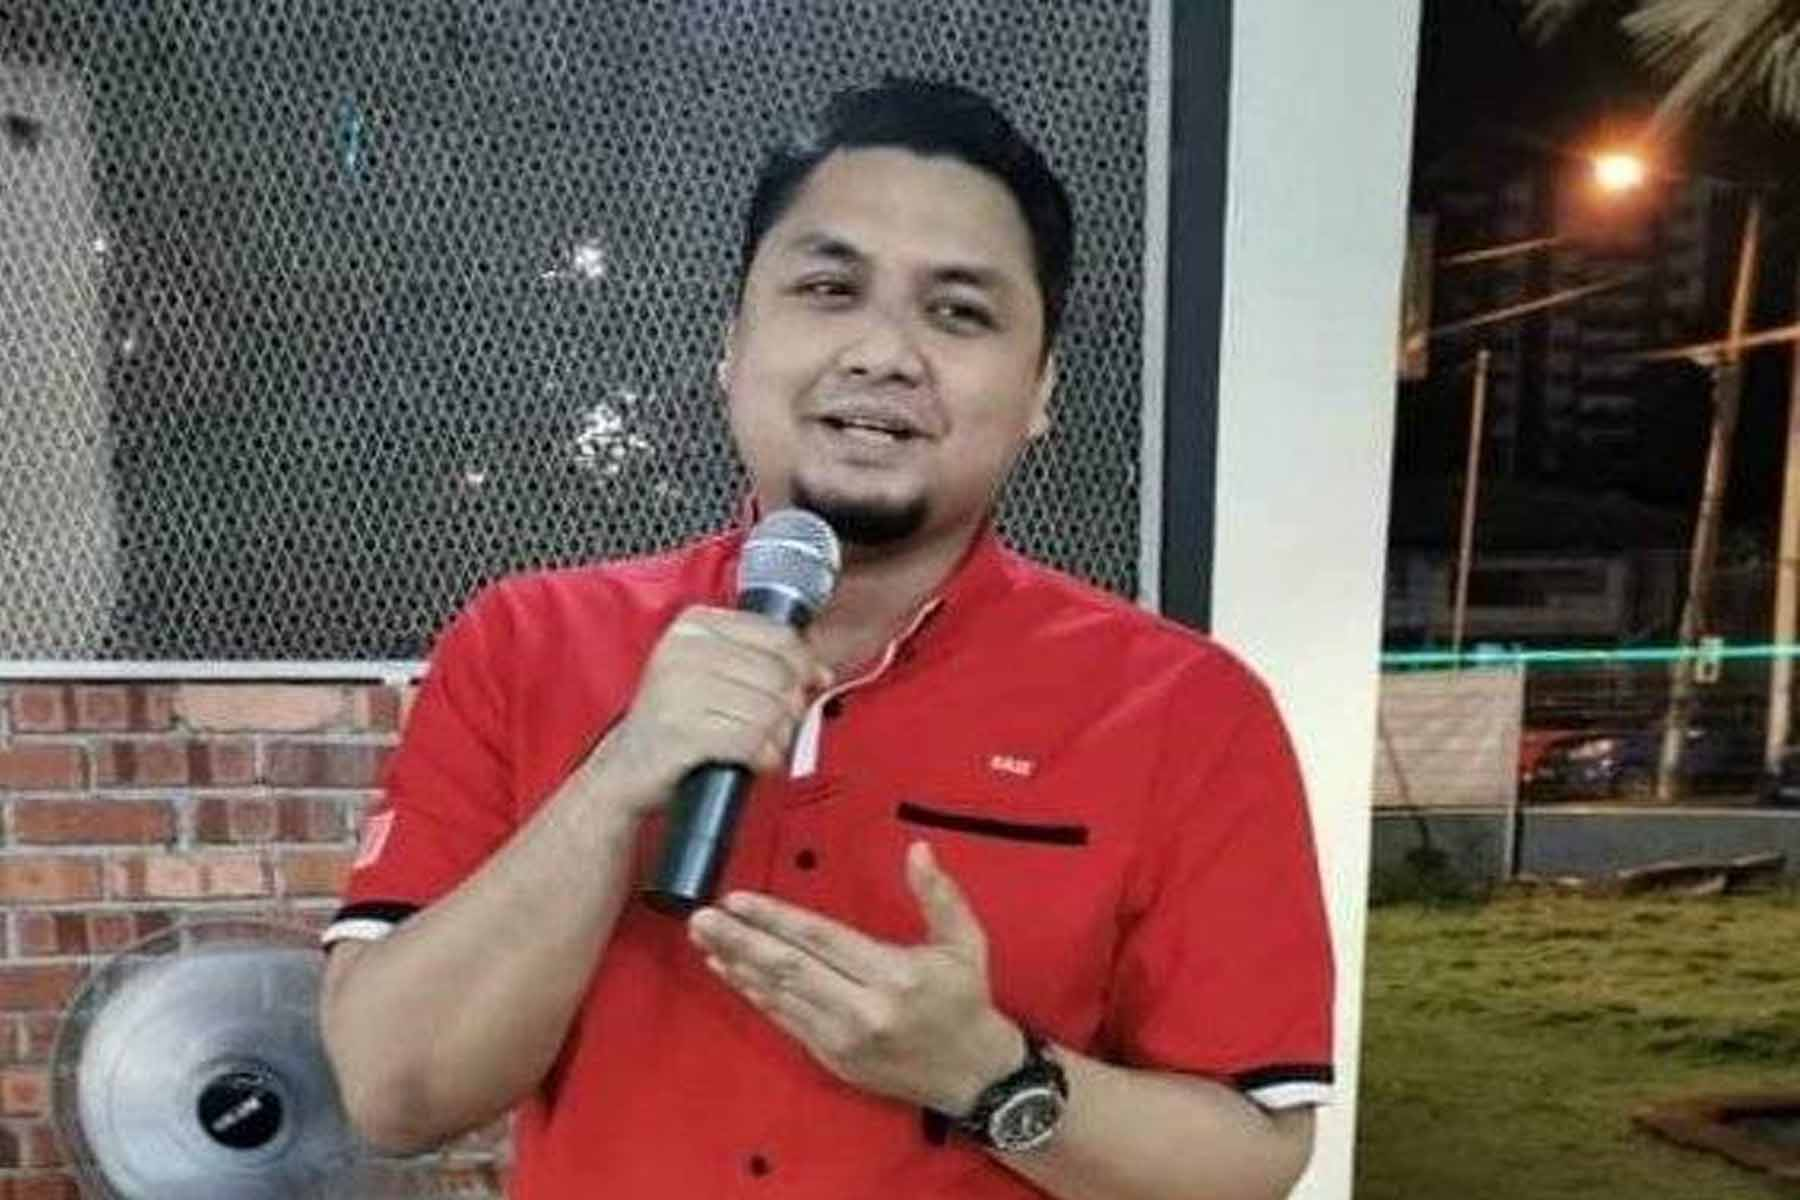 Mesyuarat MKT Umno : Bersatu desak dedah keputusan rasmi